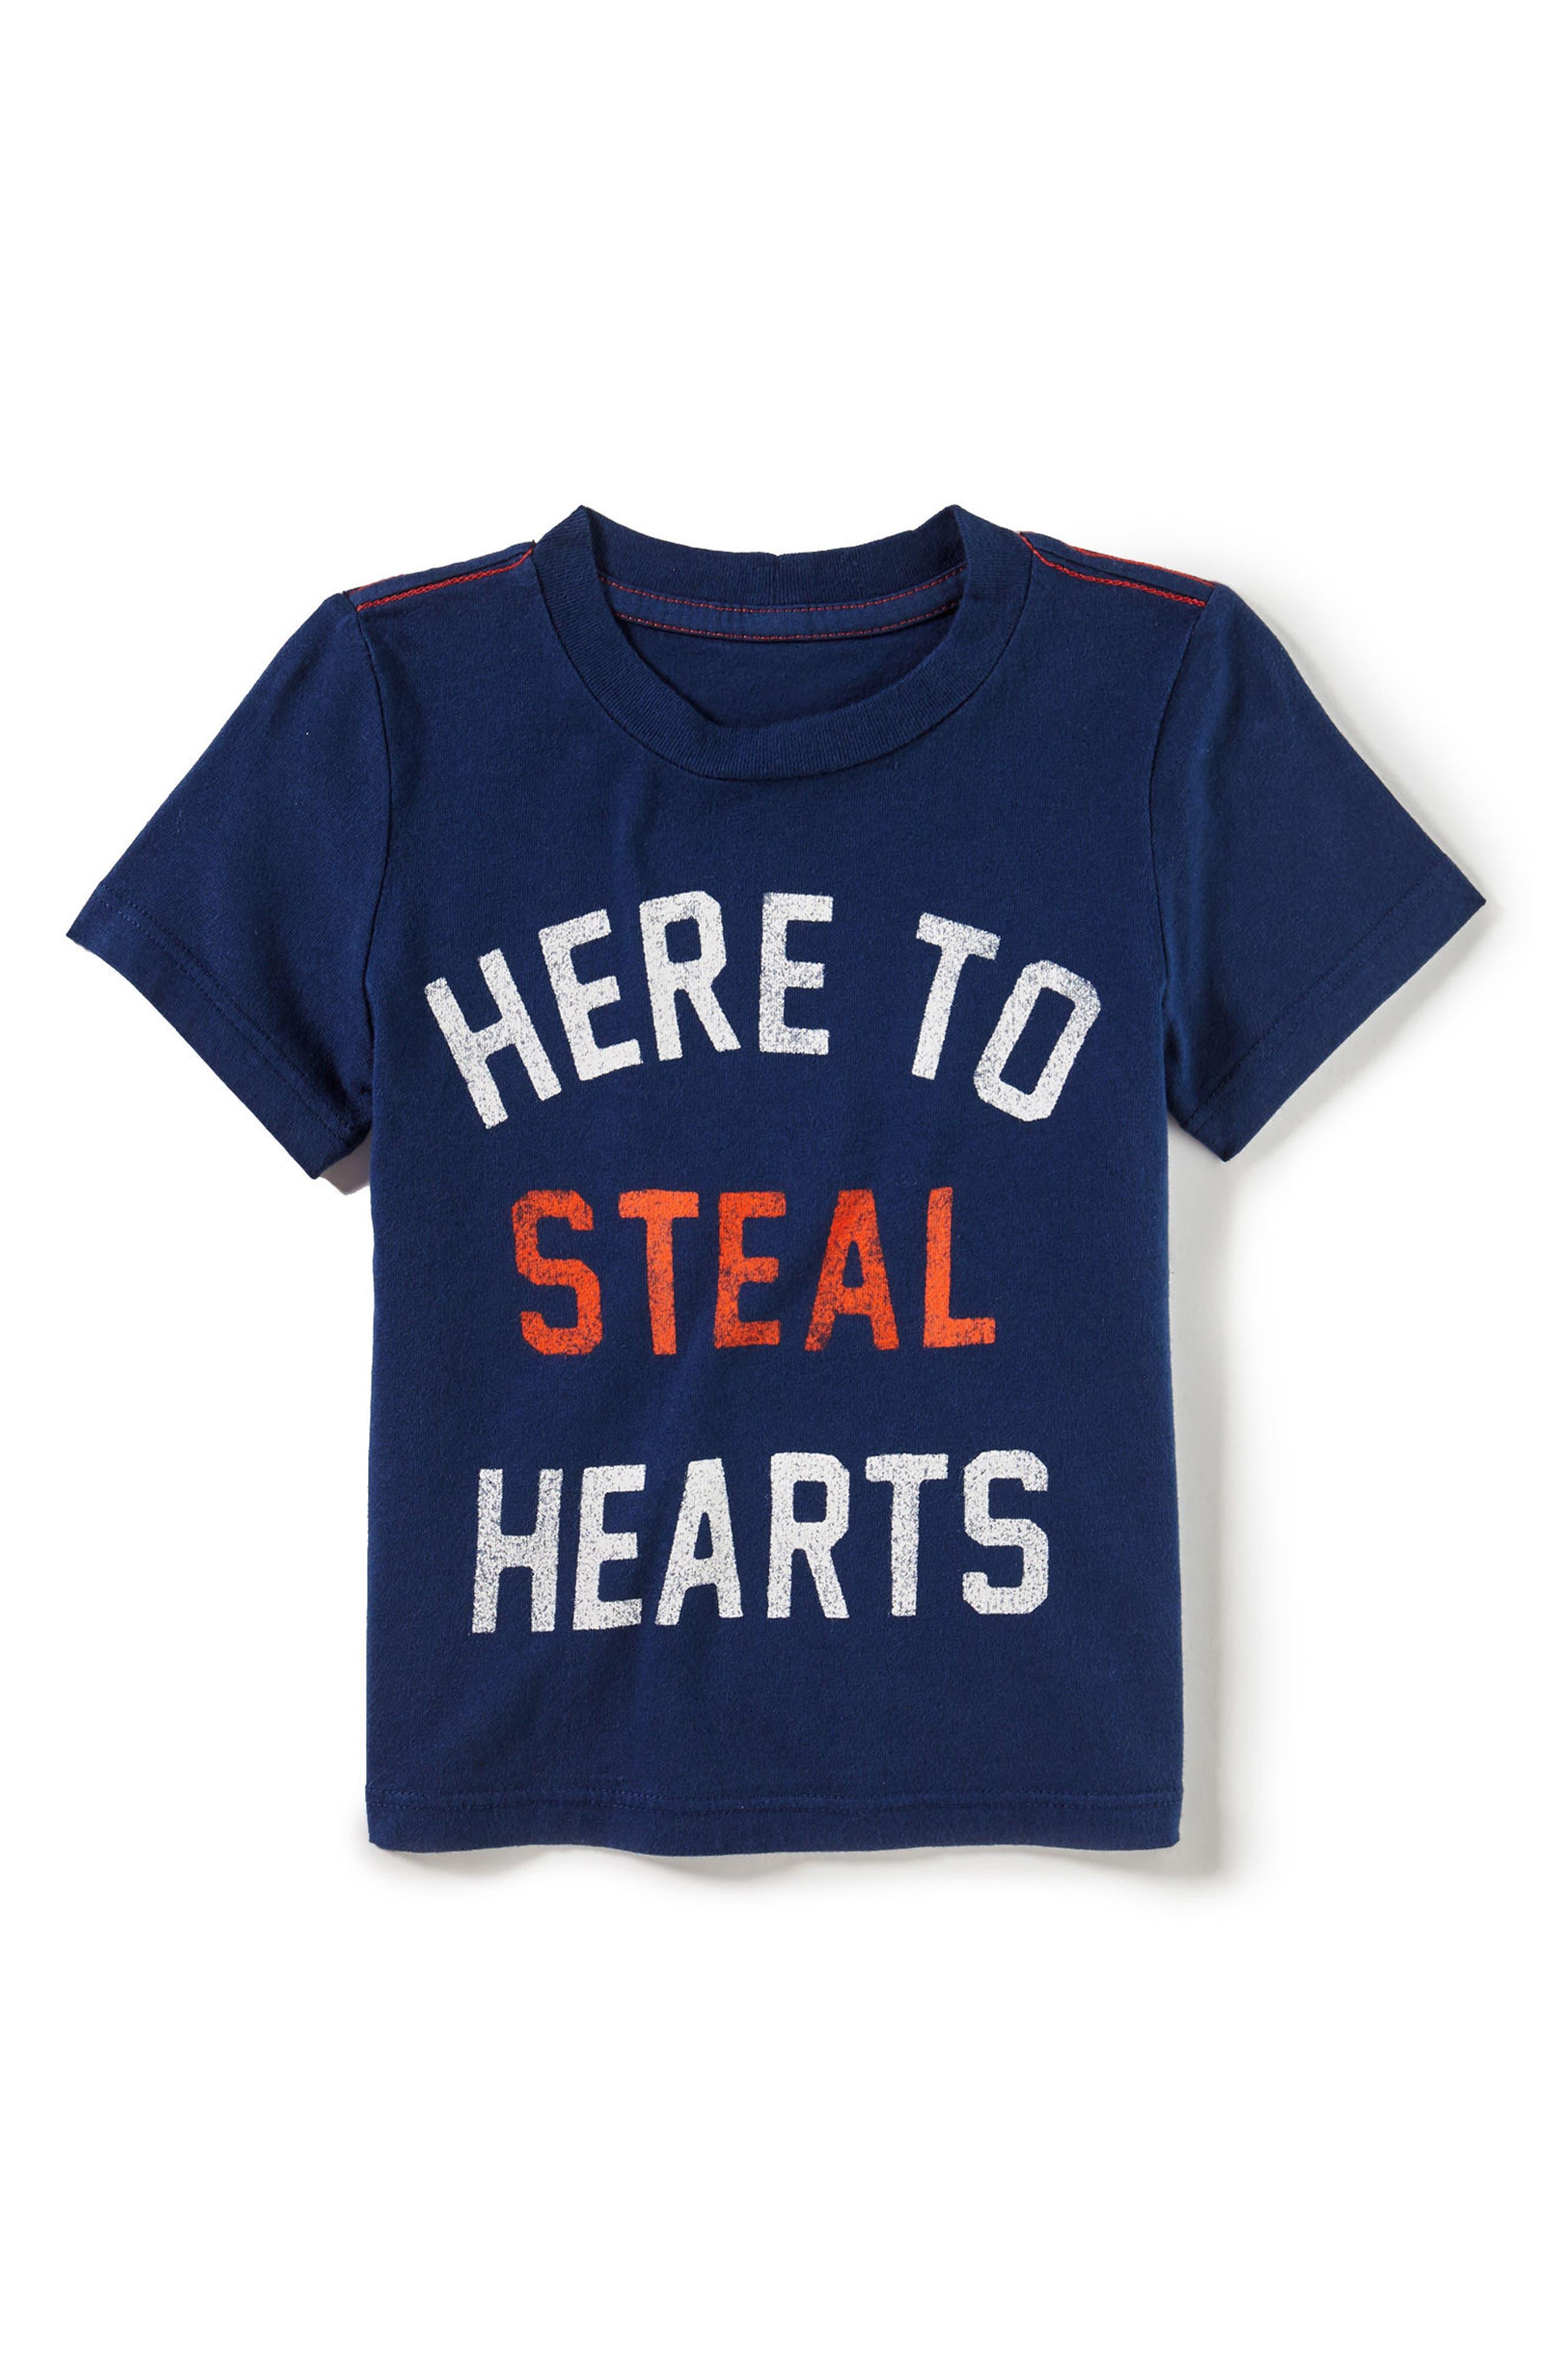 Steal Hearts Graphic T-Shirt,                             Main thumbnail 1, color,                             410